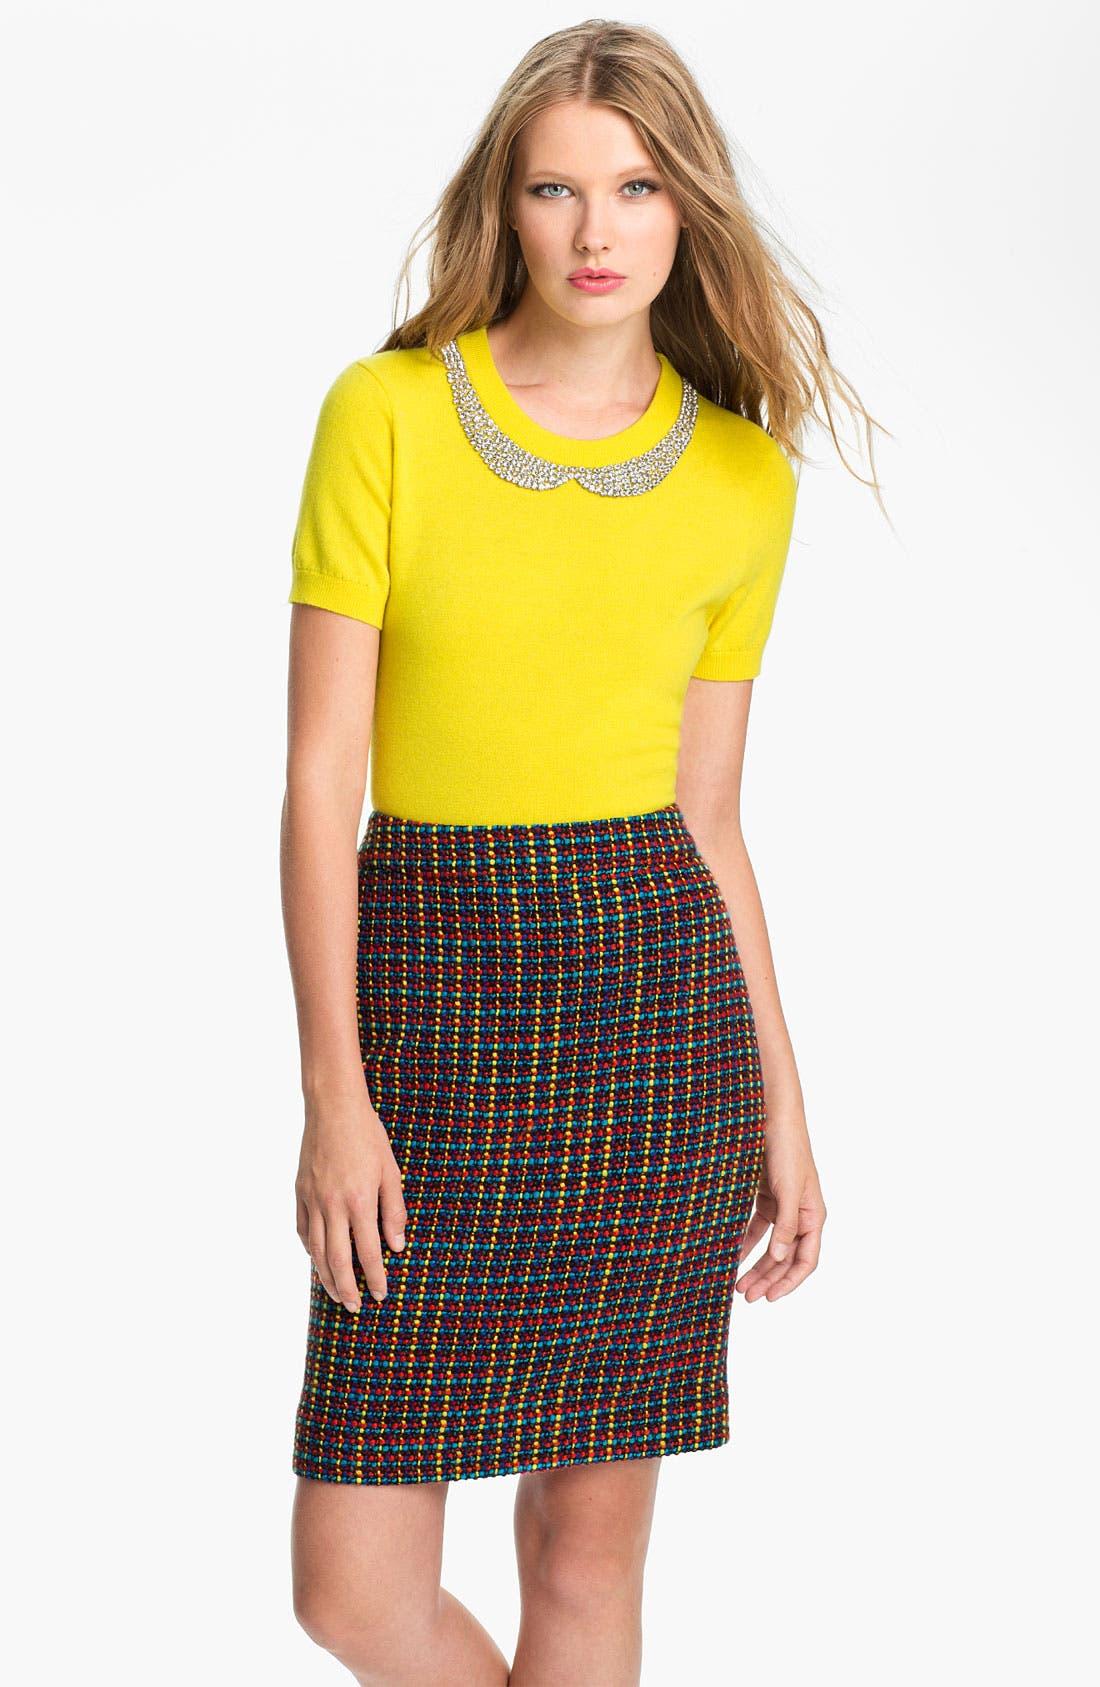 Alternate Image 1 Selected - kate spade new york 'tippy' embellished sweater